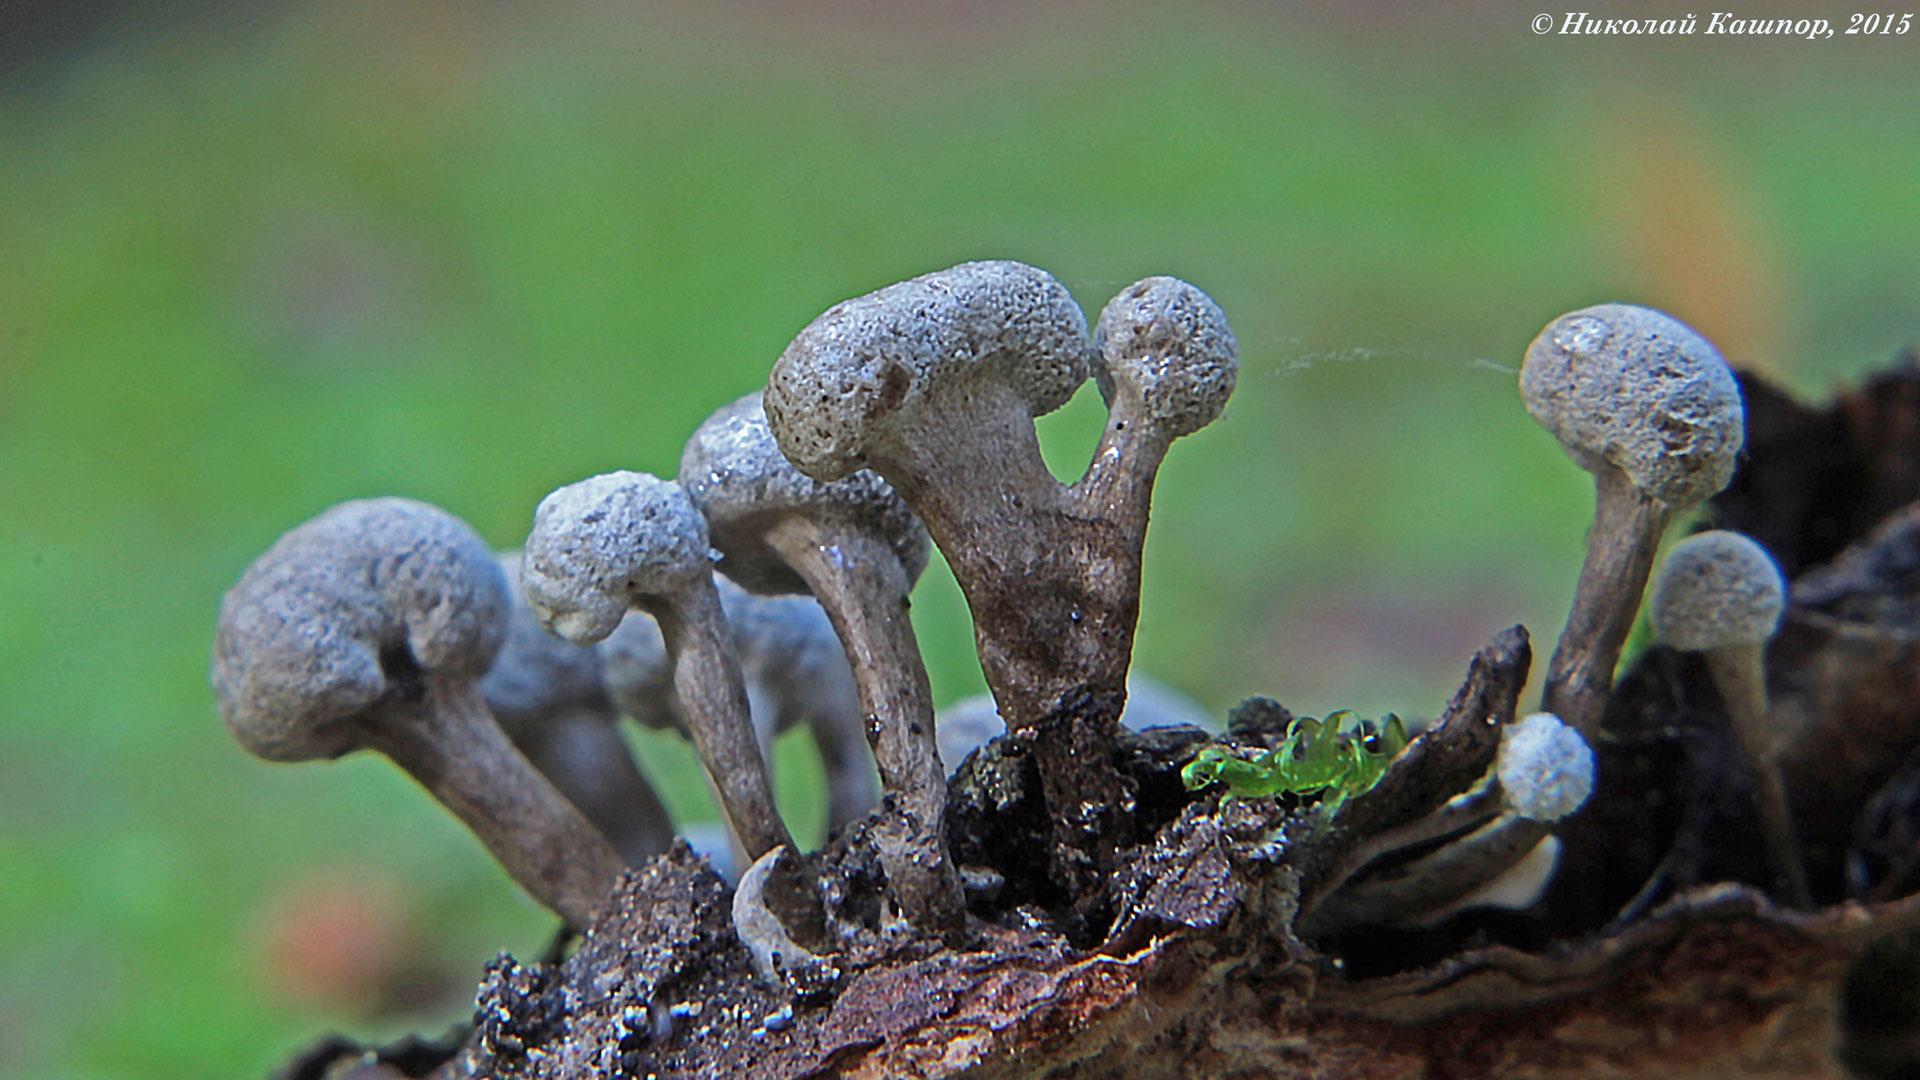 Флеогена буковая (Phleogena faginea). Автор фото: Кашпор Николай